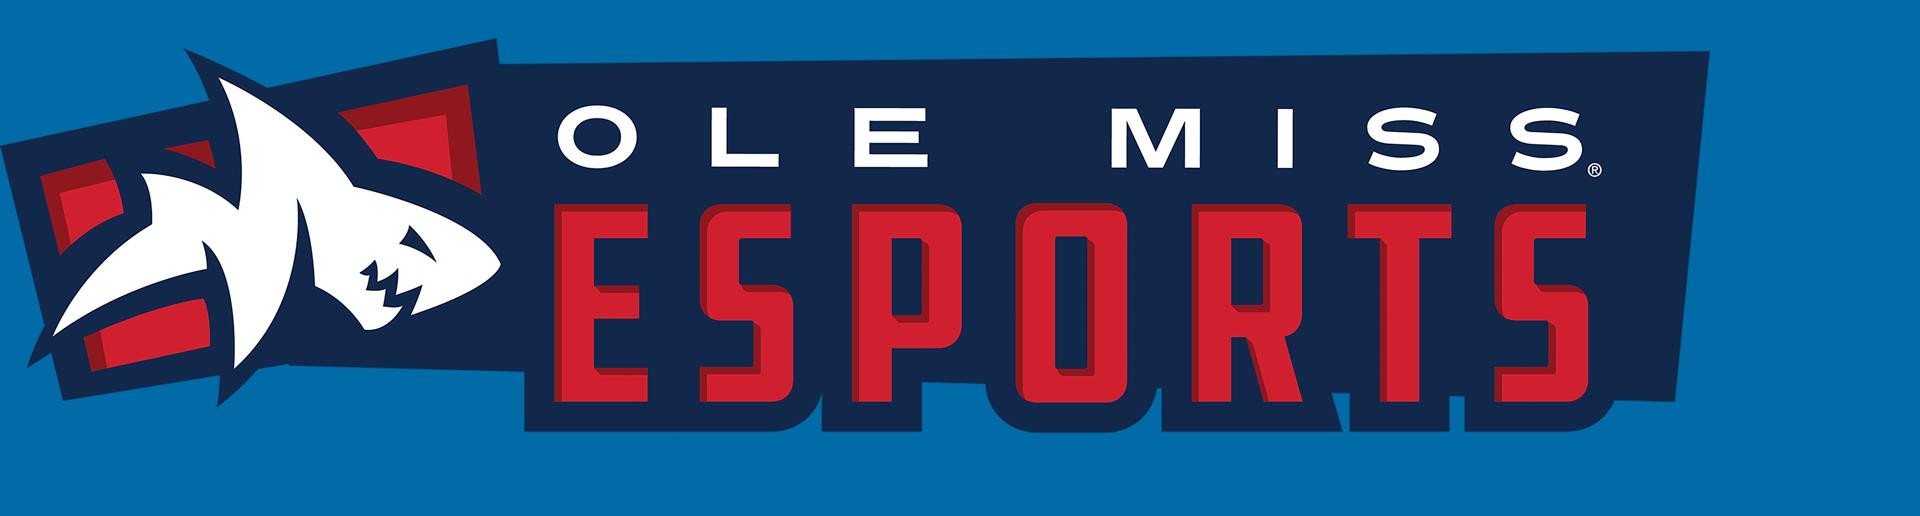 Ole Miss Esports Logo